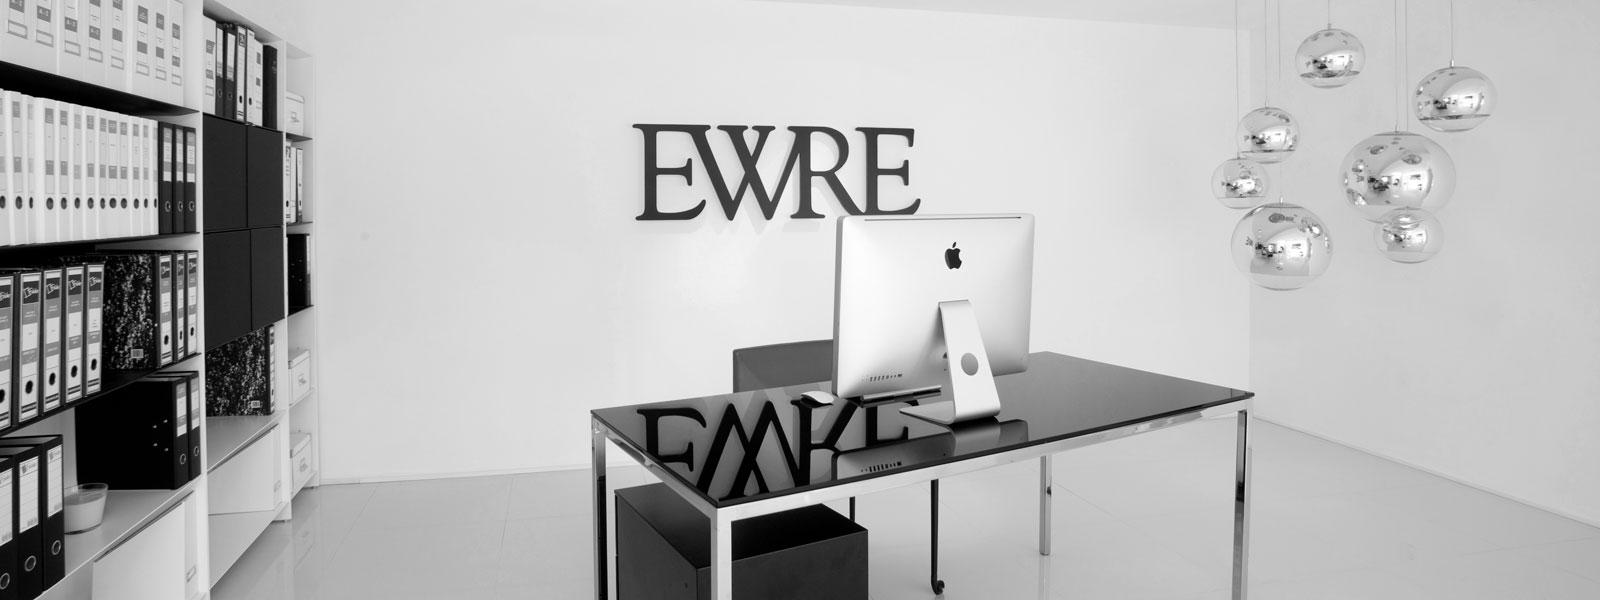 EWRE Partners